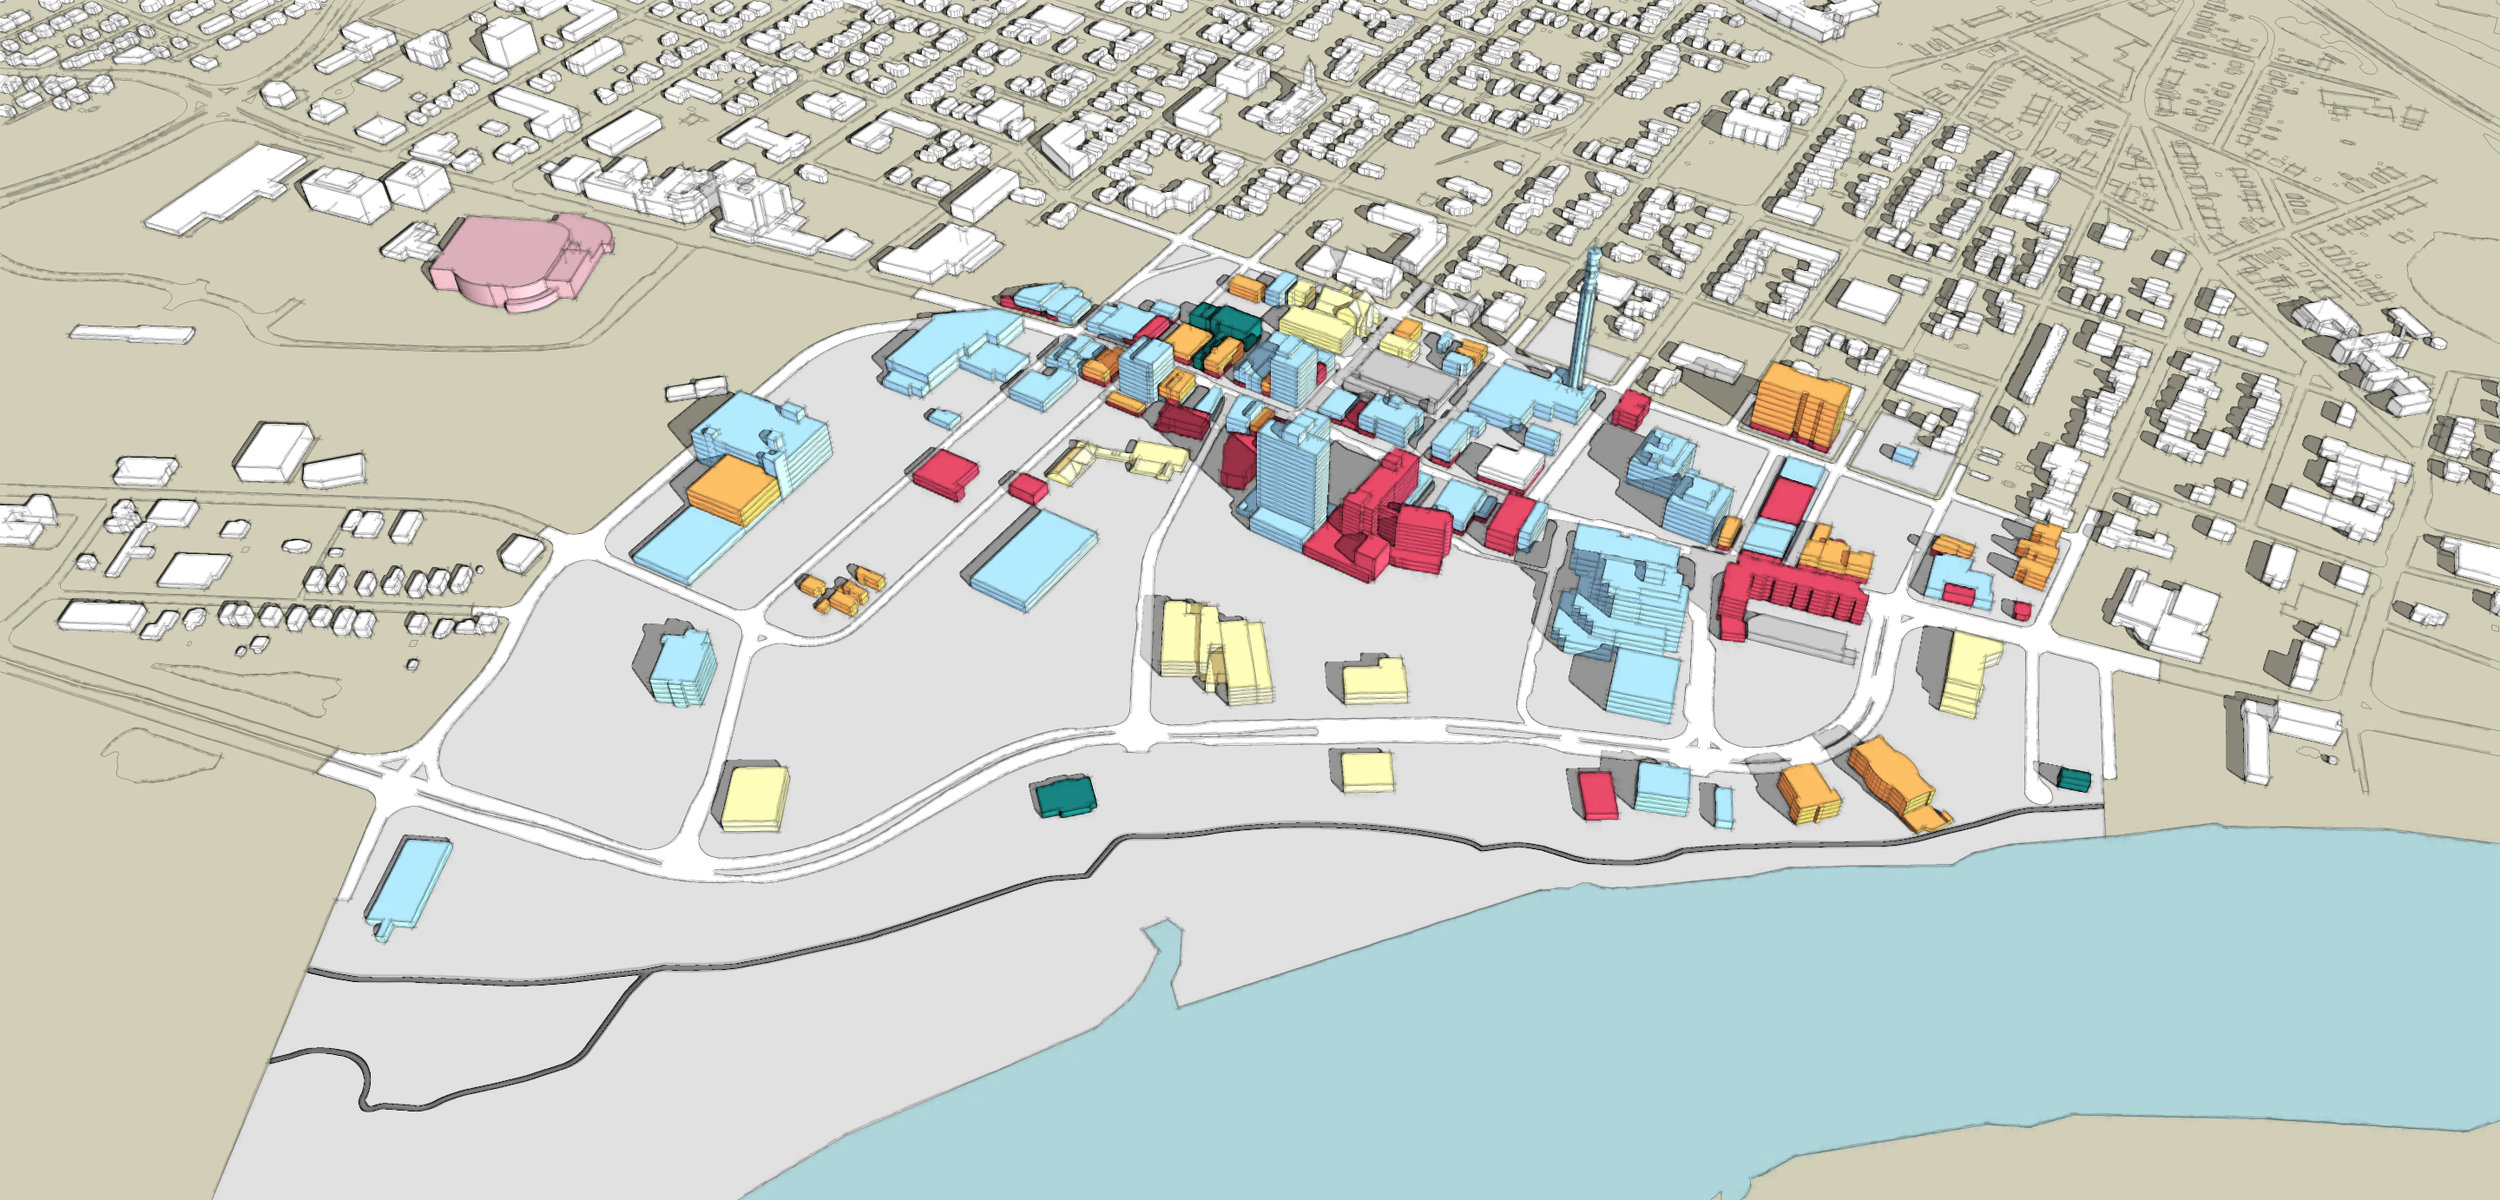 Present-day Downtown Moncton